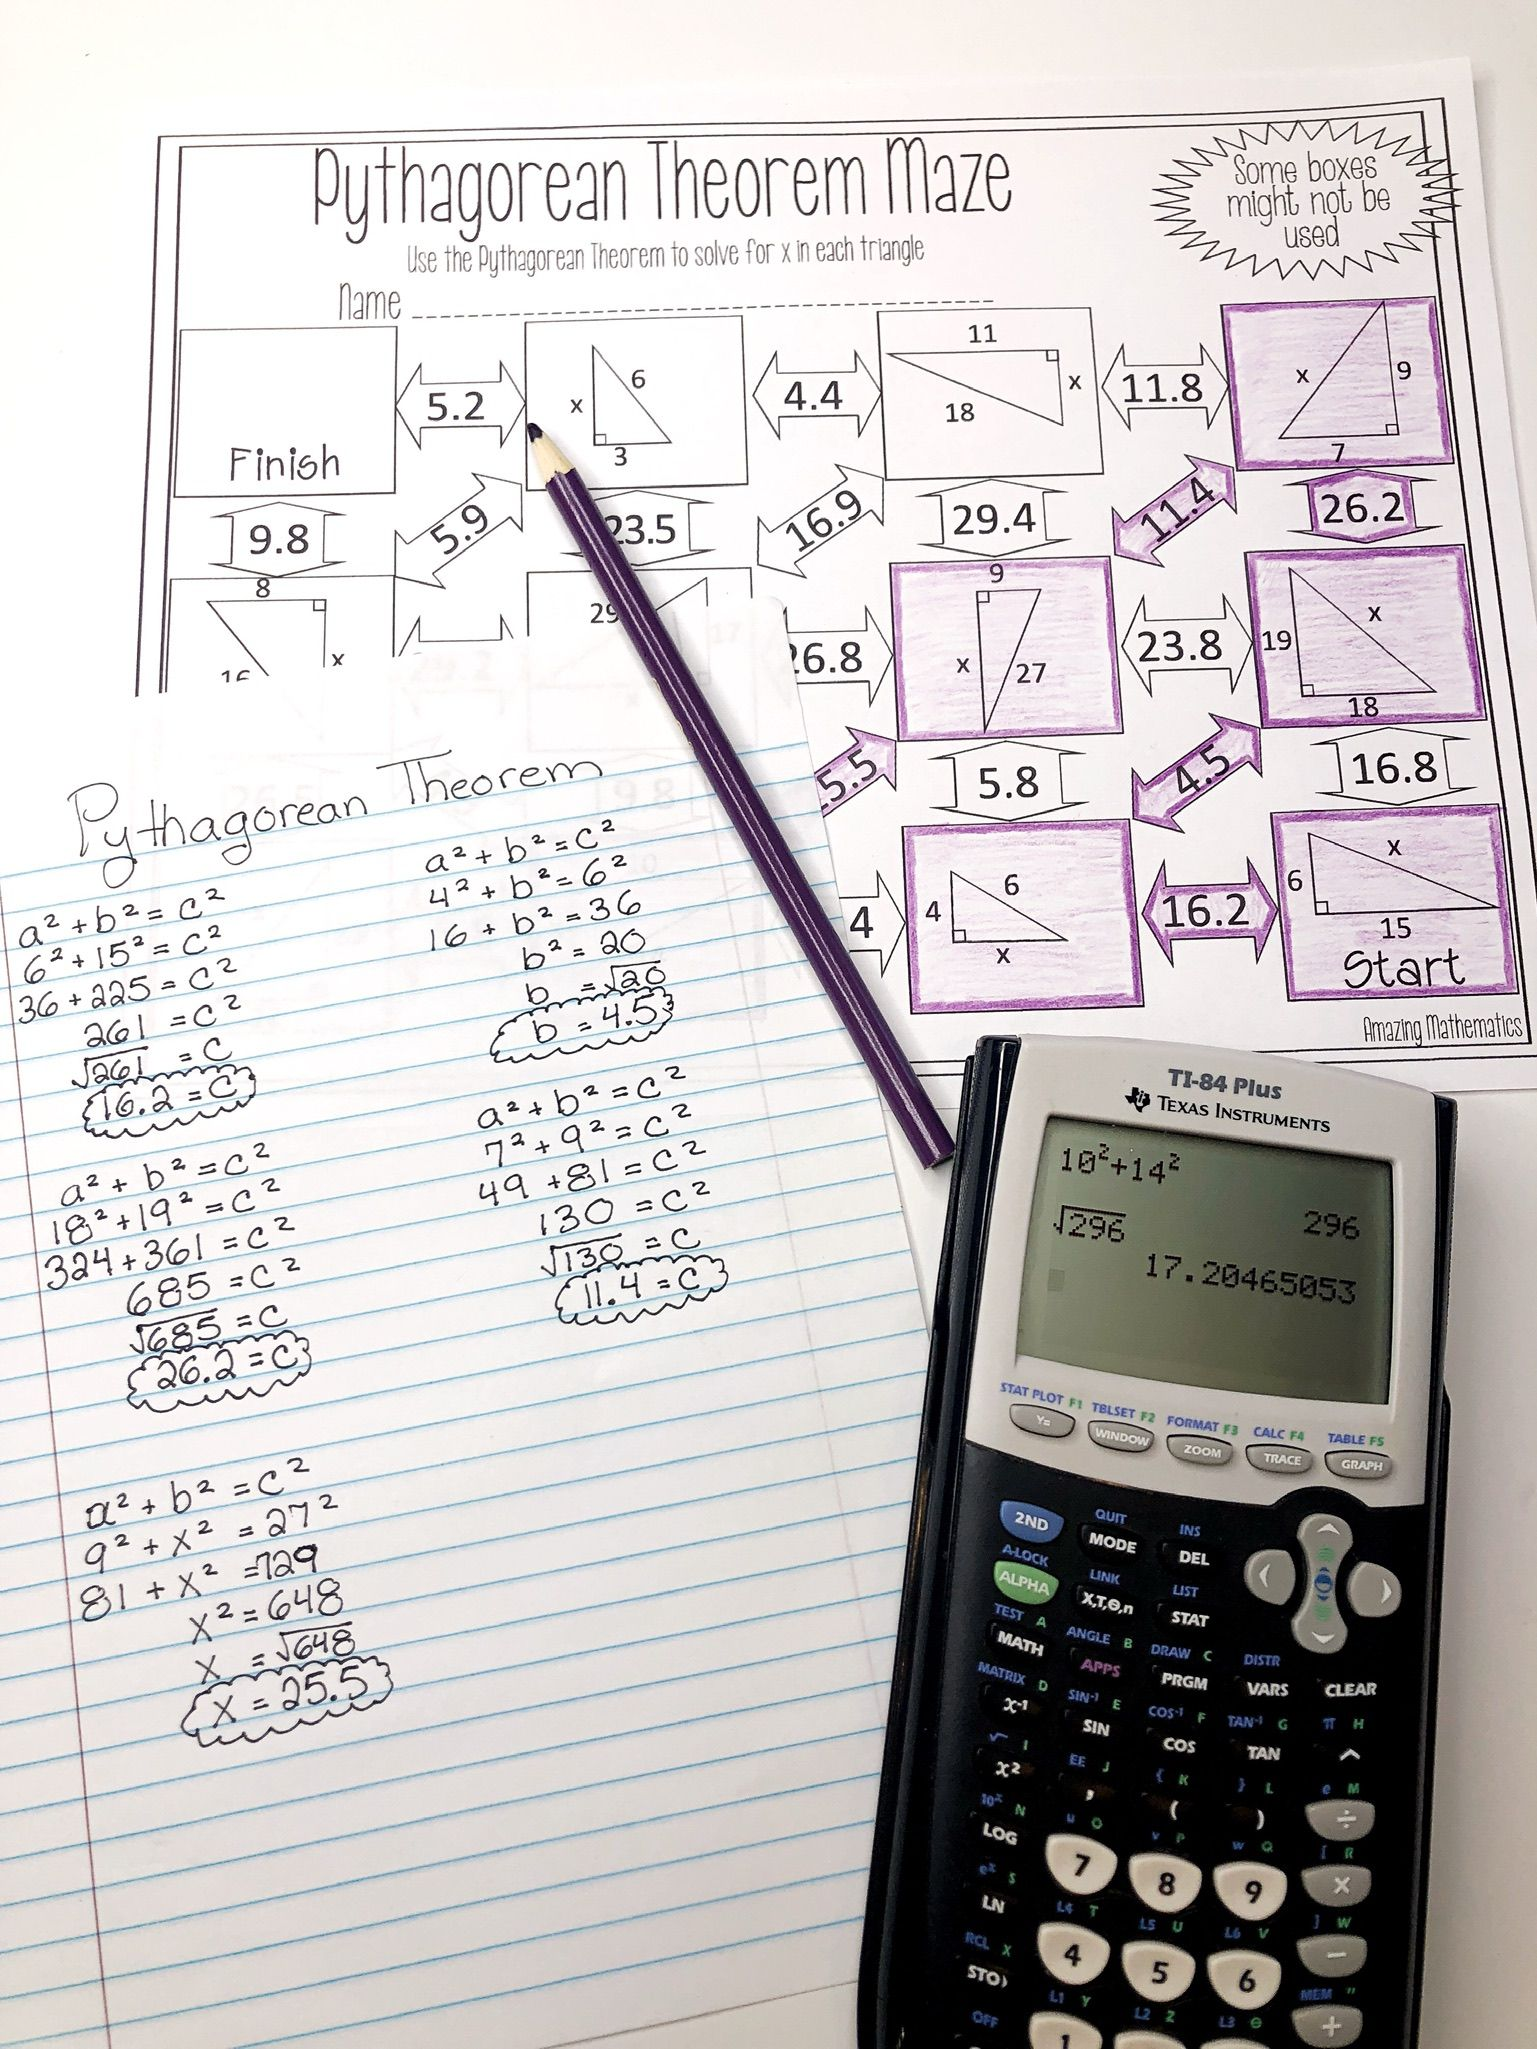 Pythagorean Theorem Worksheet Maze Activity Geometry Worksheets Pythagorean Theorem Theorems